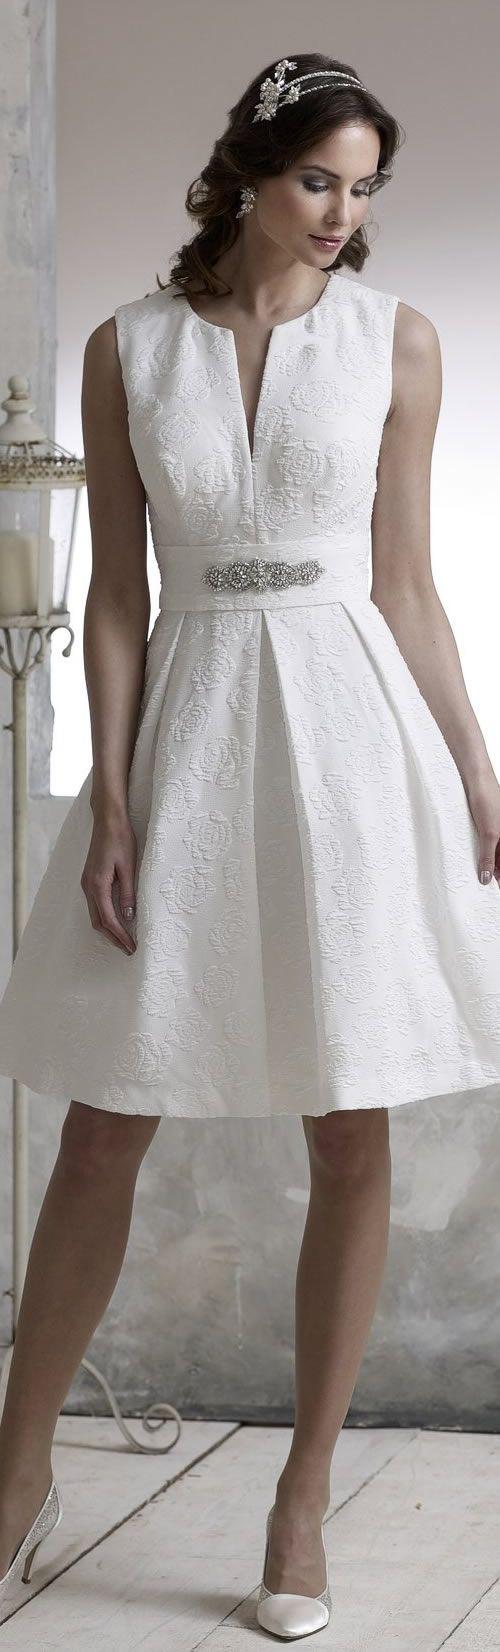 D'Zage Short Wedding Dress